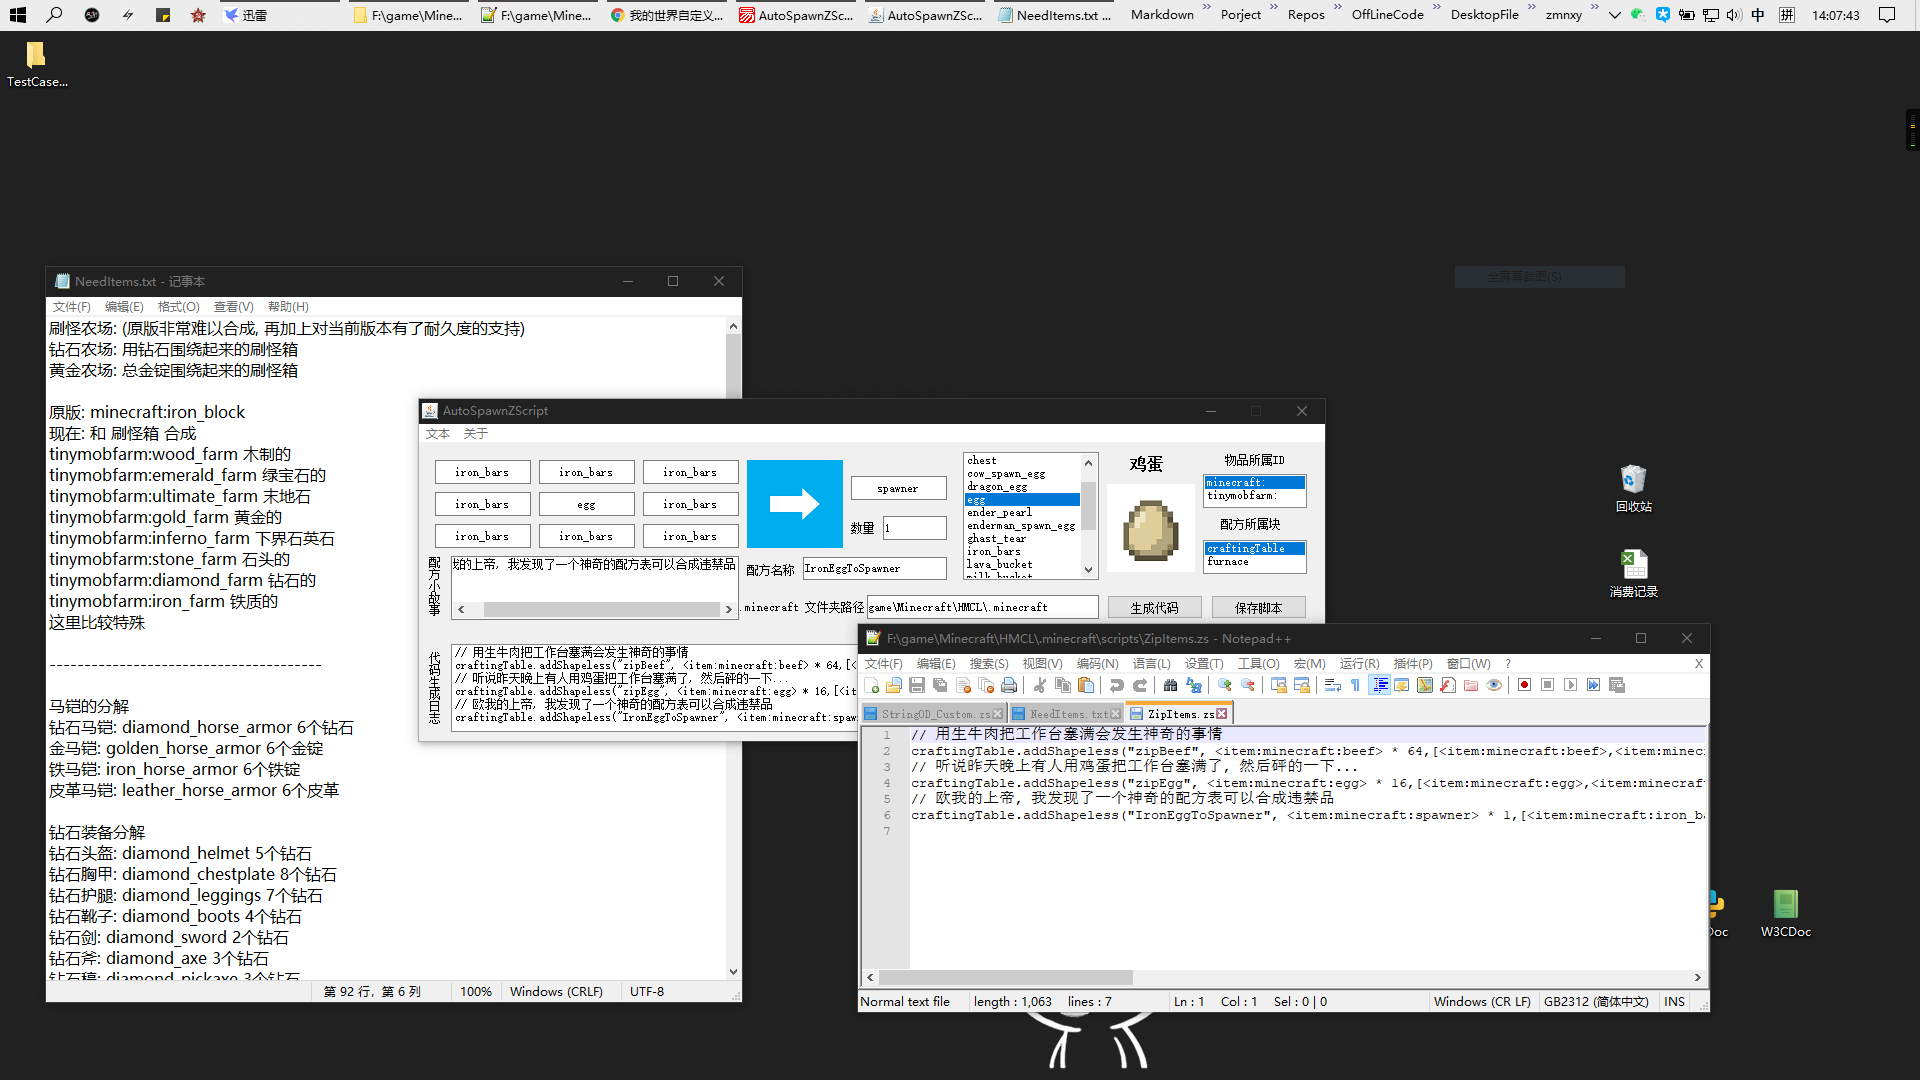 AutoSpawnZScript - v0.4